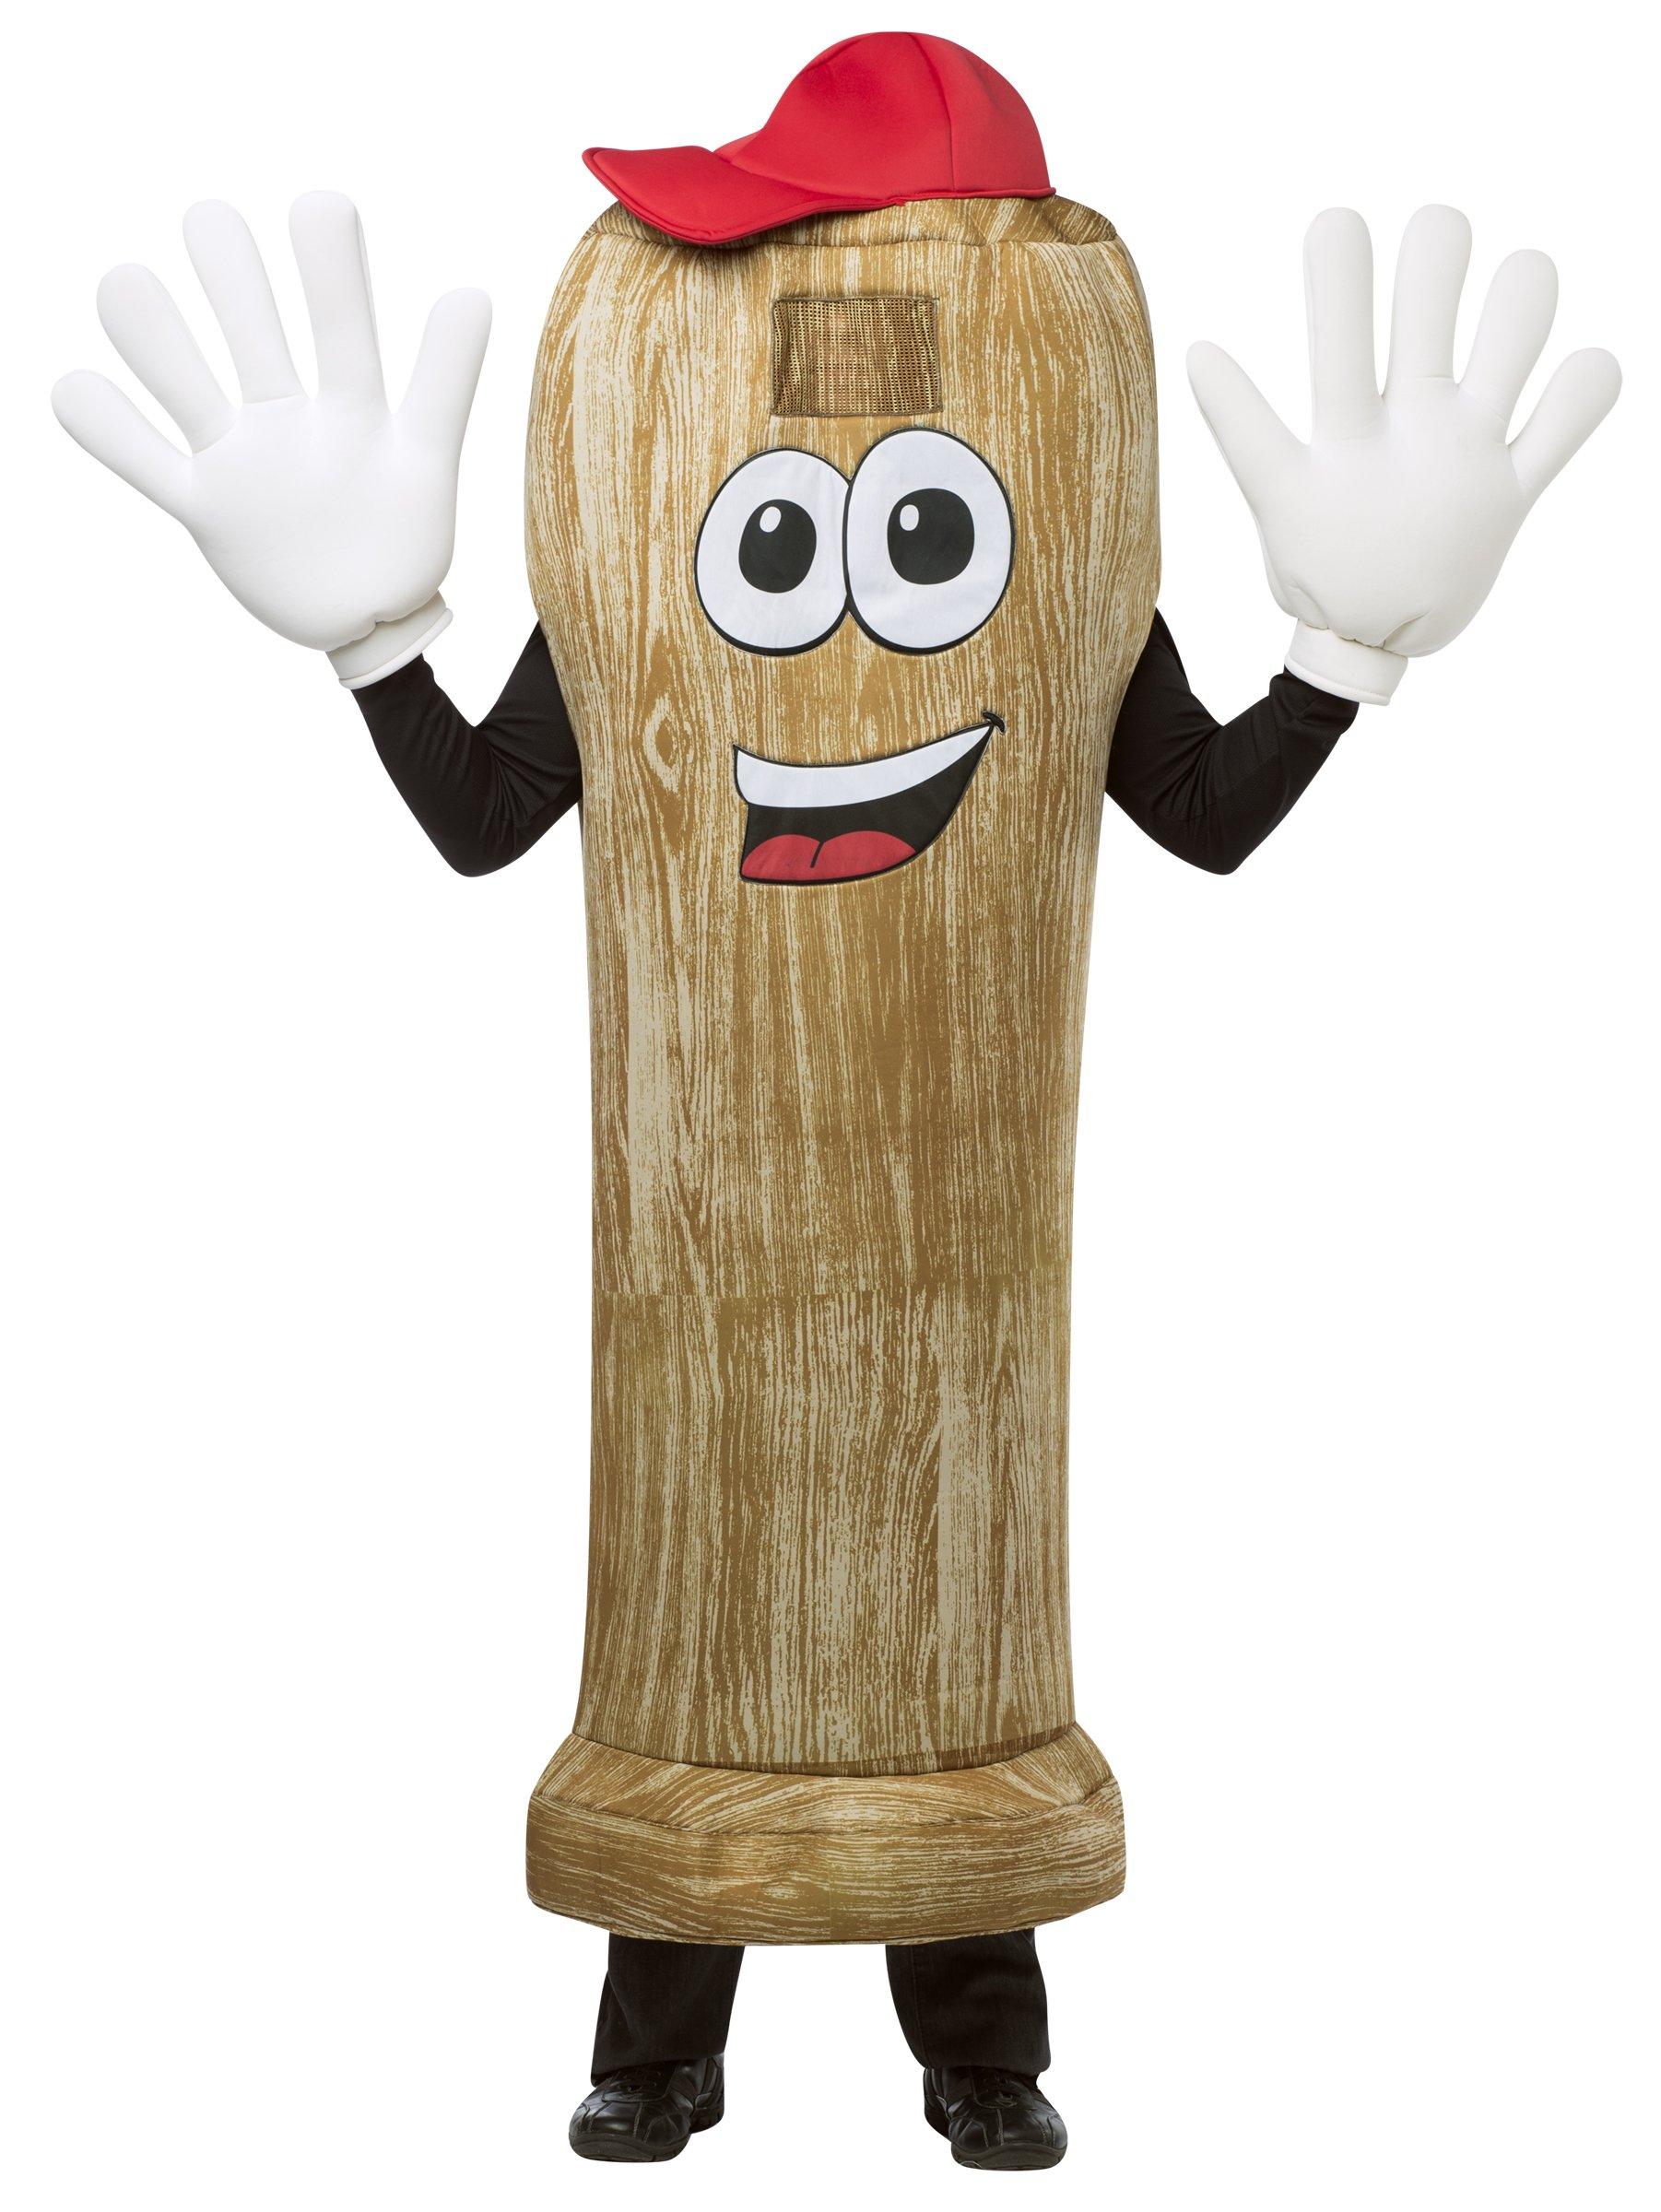 Waver Costumes Adult Baseball Bat Mascot Costume by WAVER COSTUMES (Image #1)